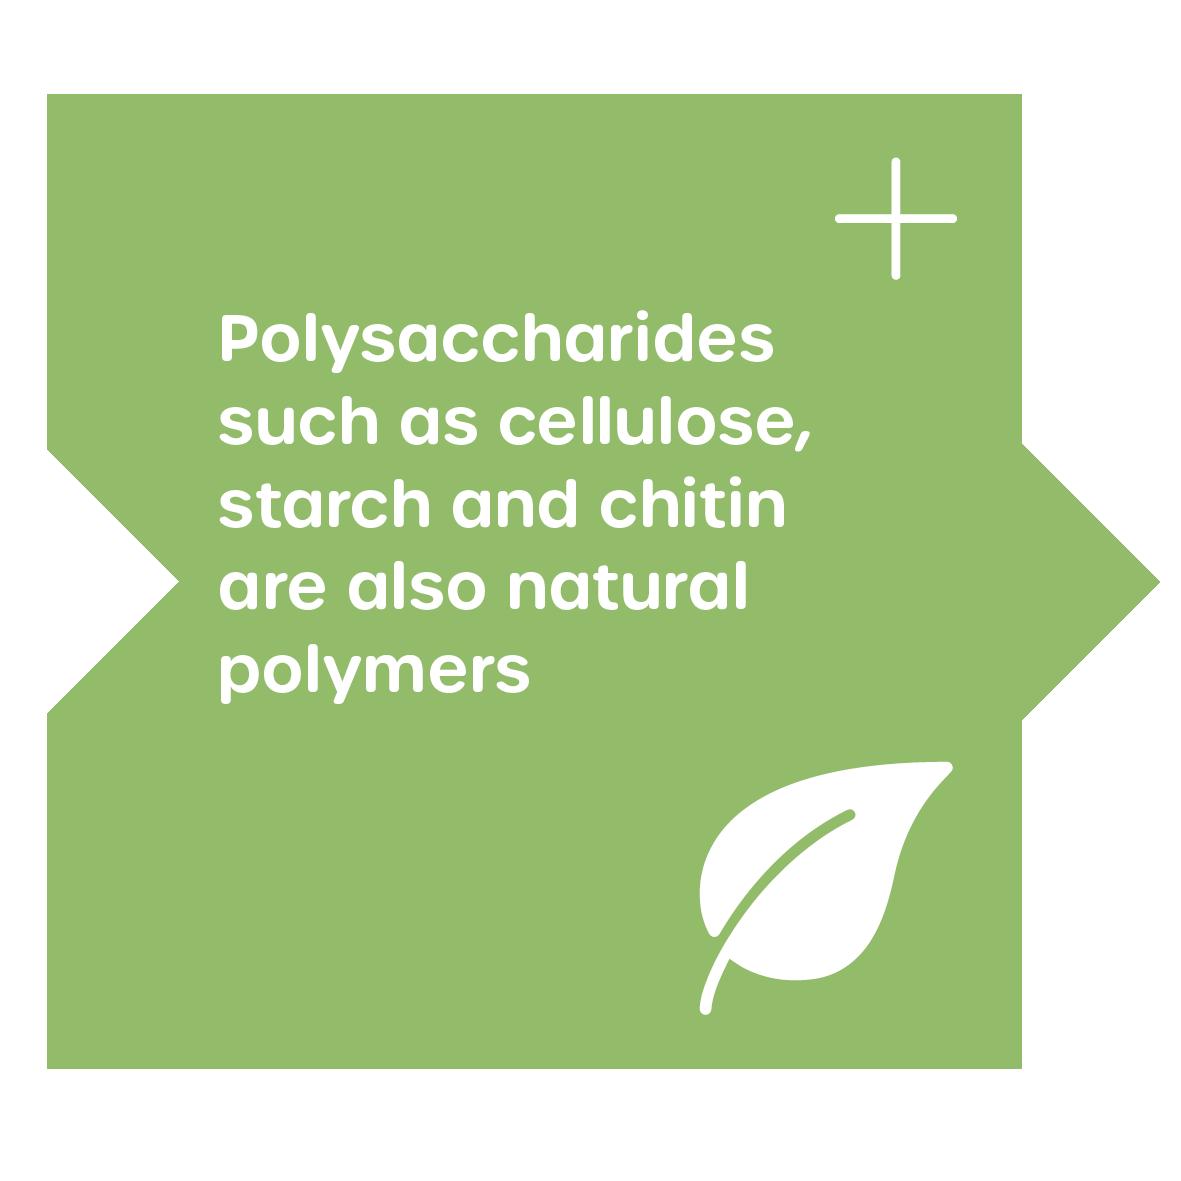 Polysaacharide are biopolymers